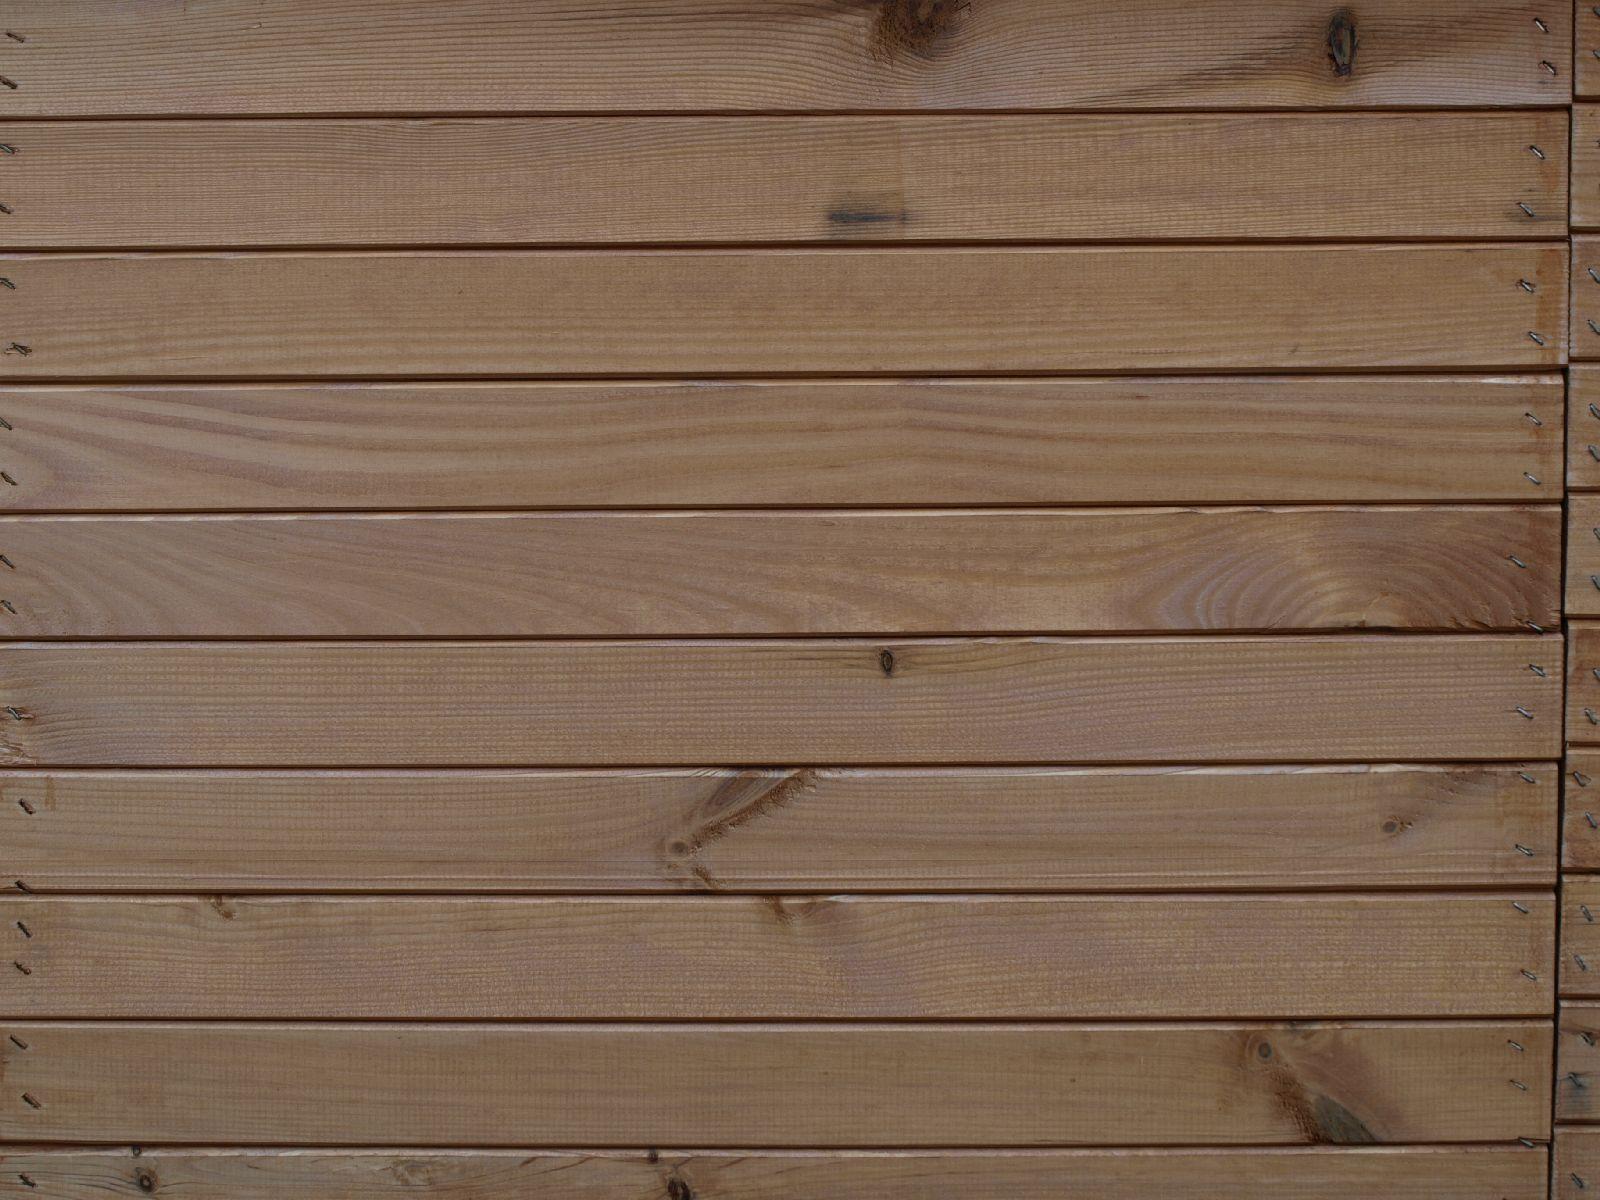 Wood_Texture_A_P4120925